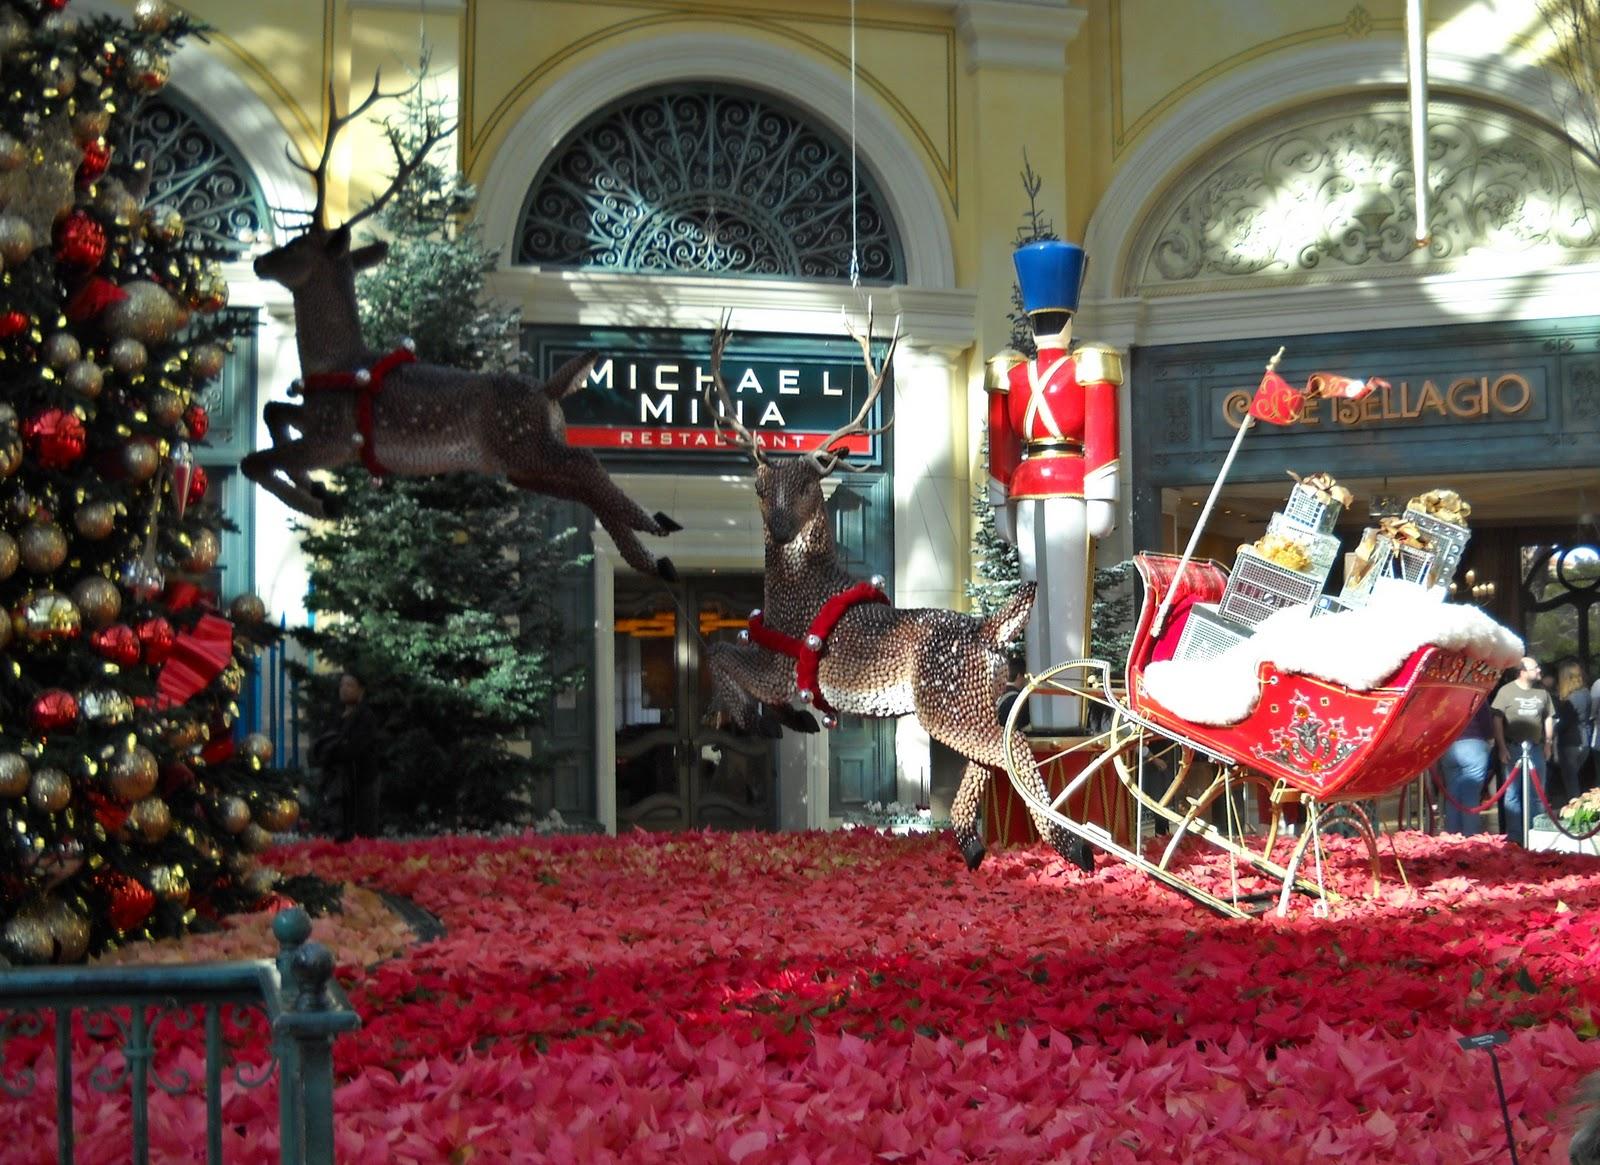 Snippets 'N Stuff: Las Vegas Bellagio at Christmas